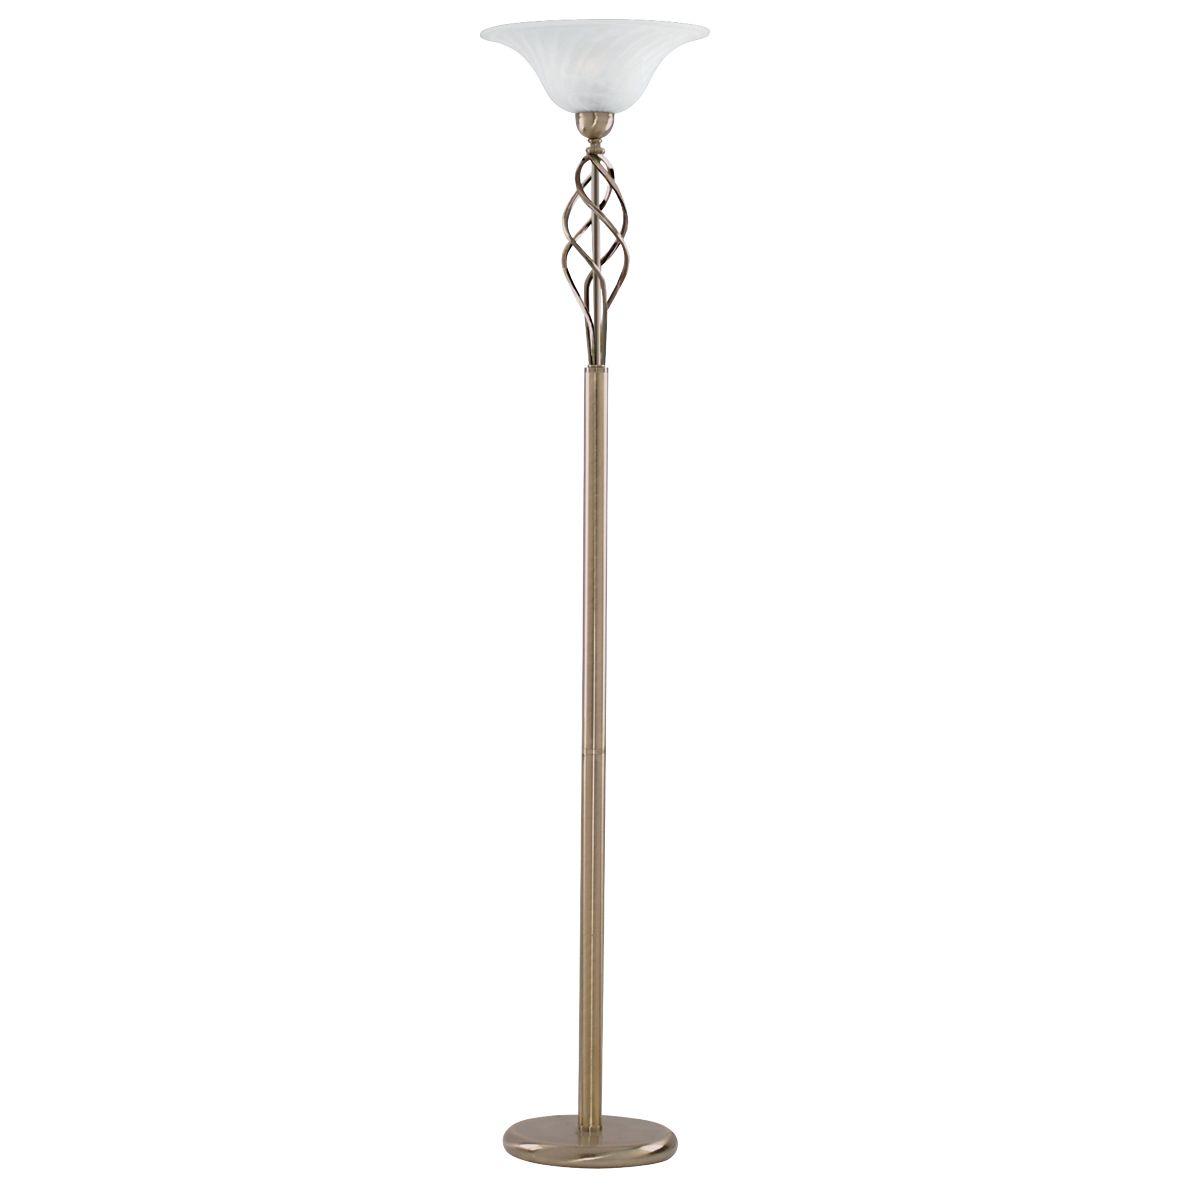 Zanzibar Antique Brass Floor Lamp With Swirl Marble Glass Diffuser